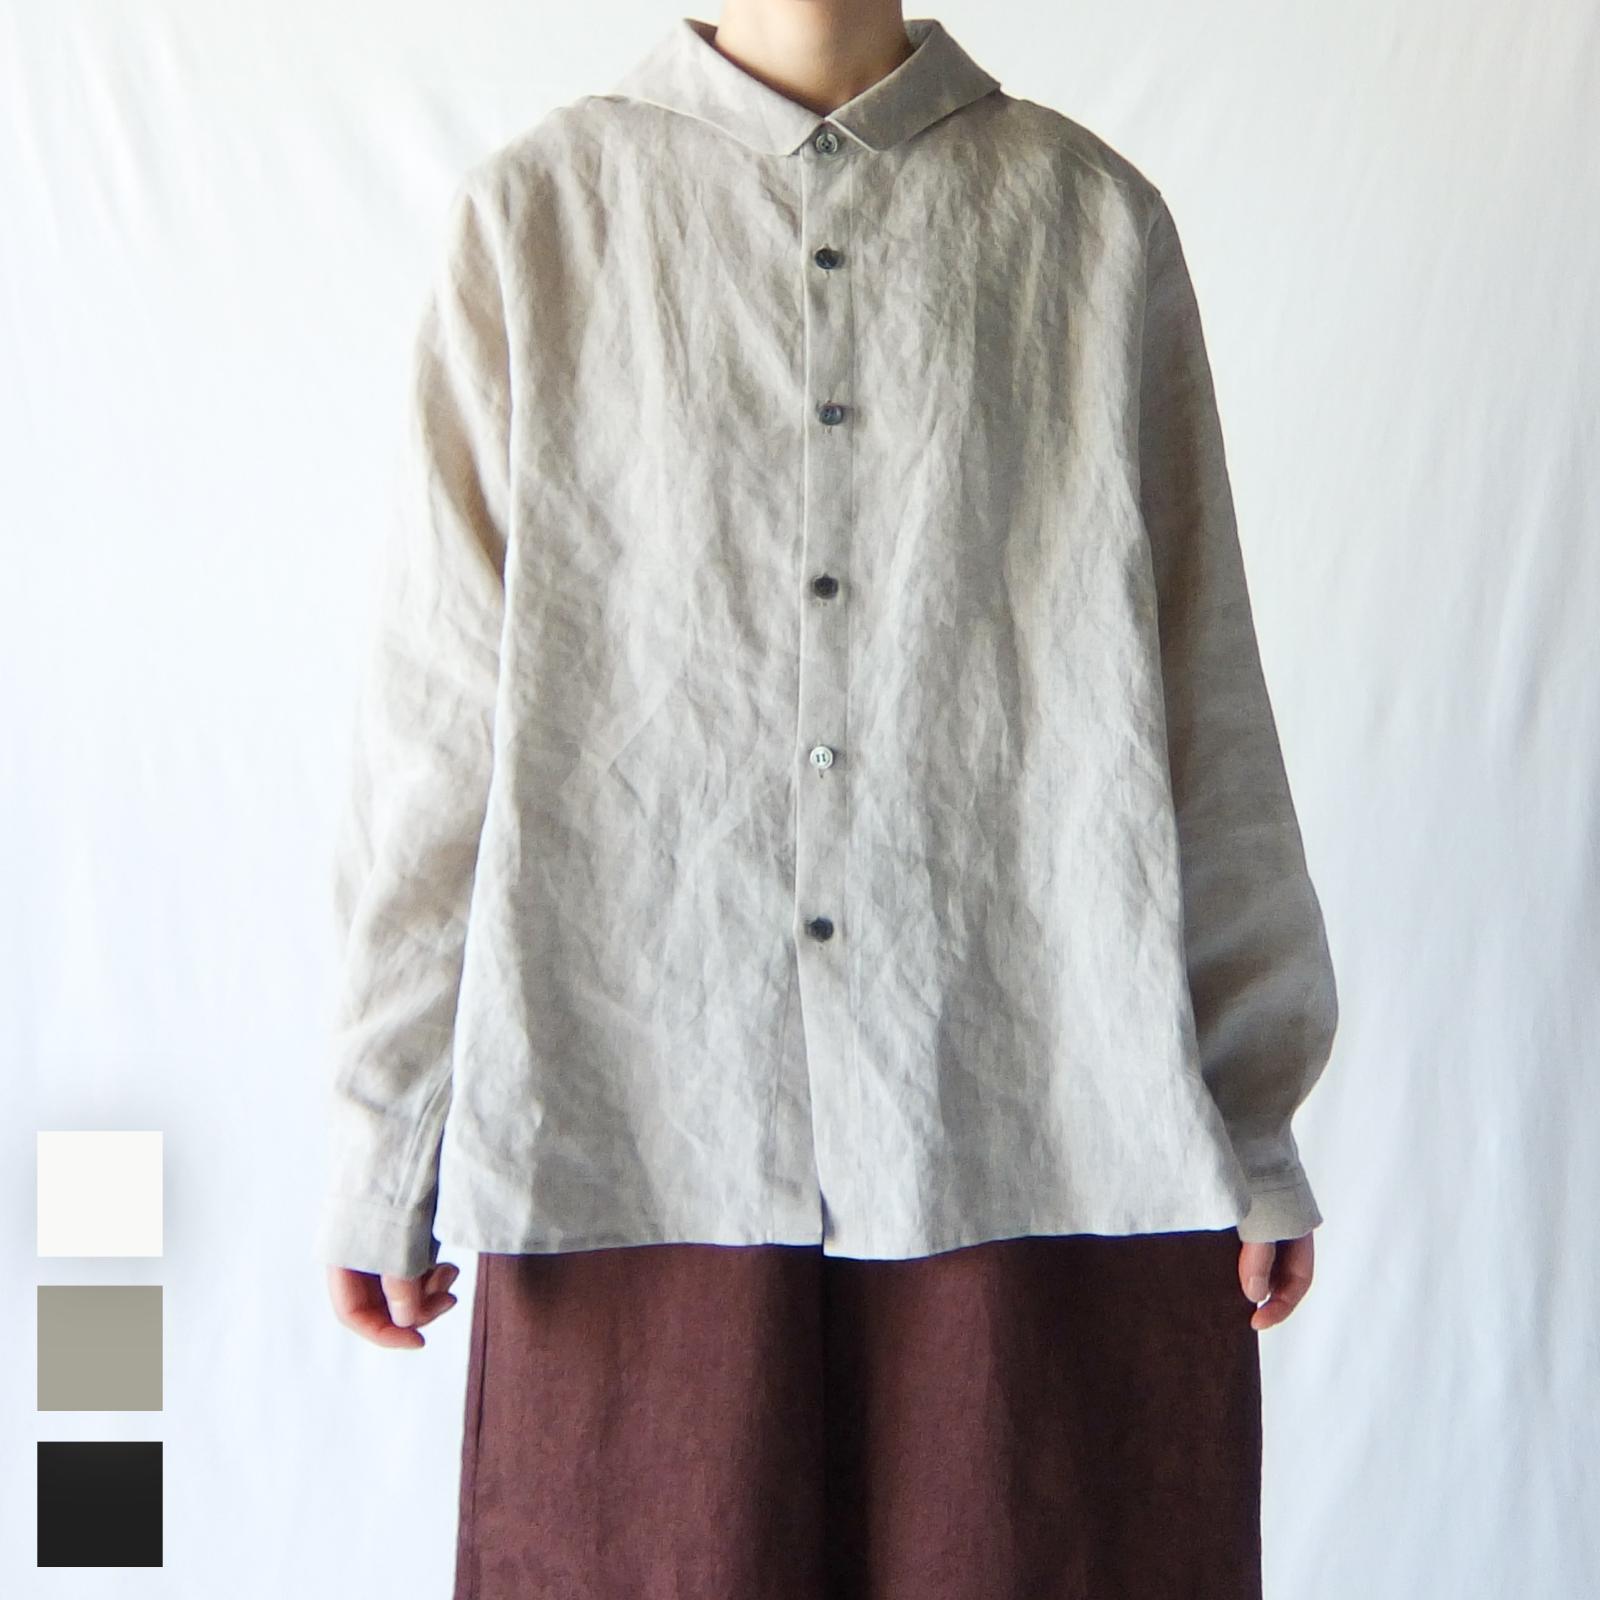 Vlas Blomme - KL Heritage 60 セーラーカラーシャツ - Black / Off White / Flax